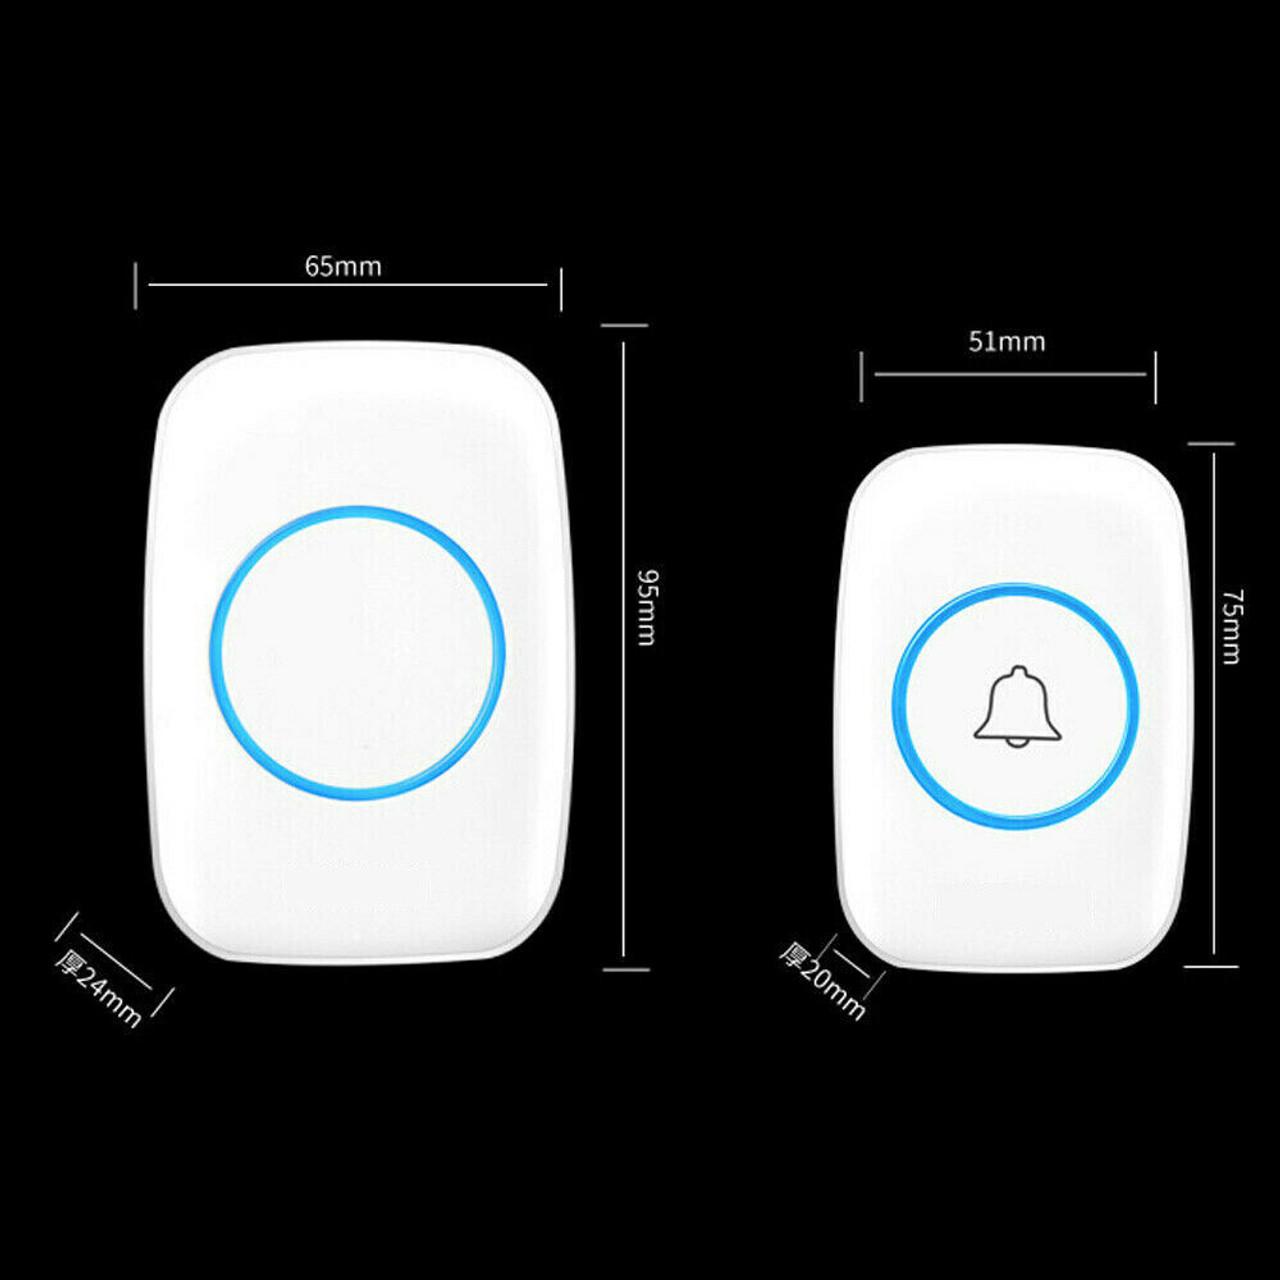 Wireless Doorbell Chime Waterproof Plugin Receiver Adjustable Volume 1000FT Kit